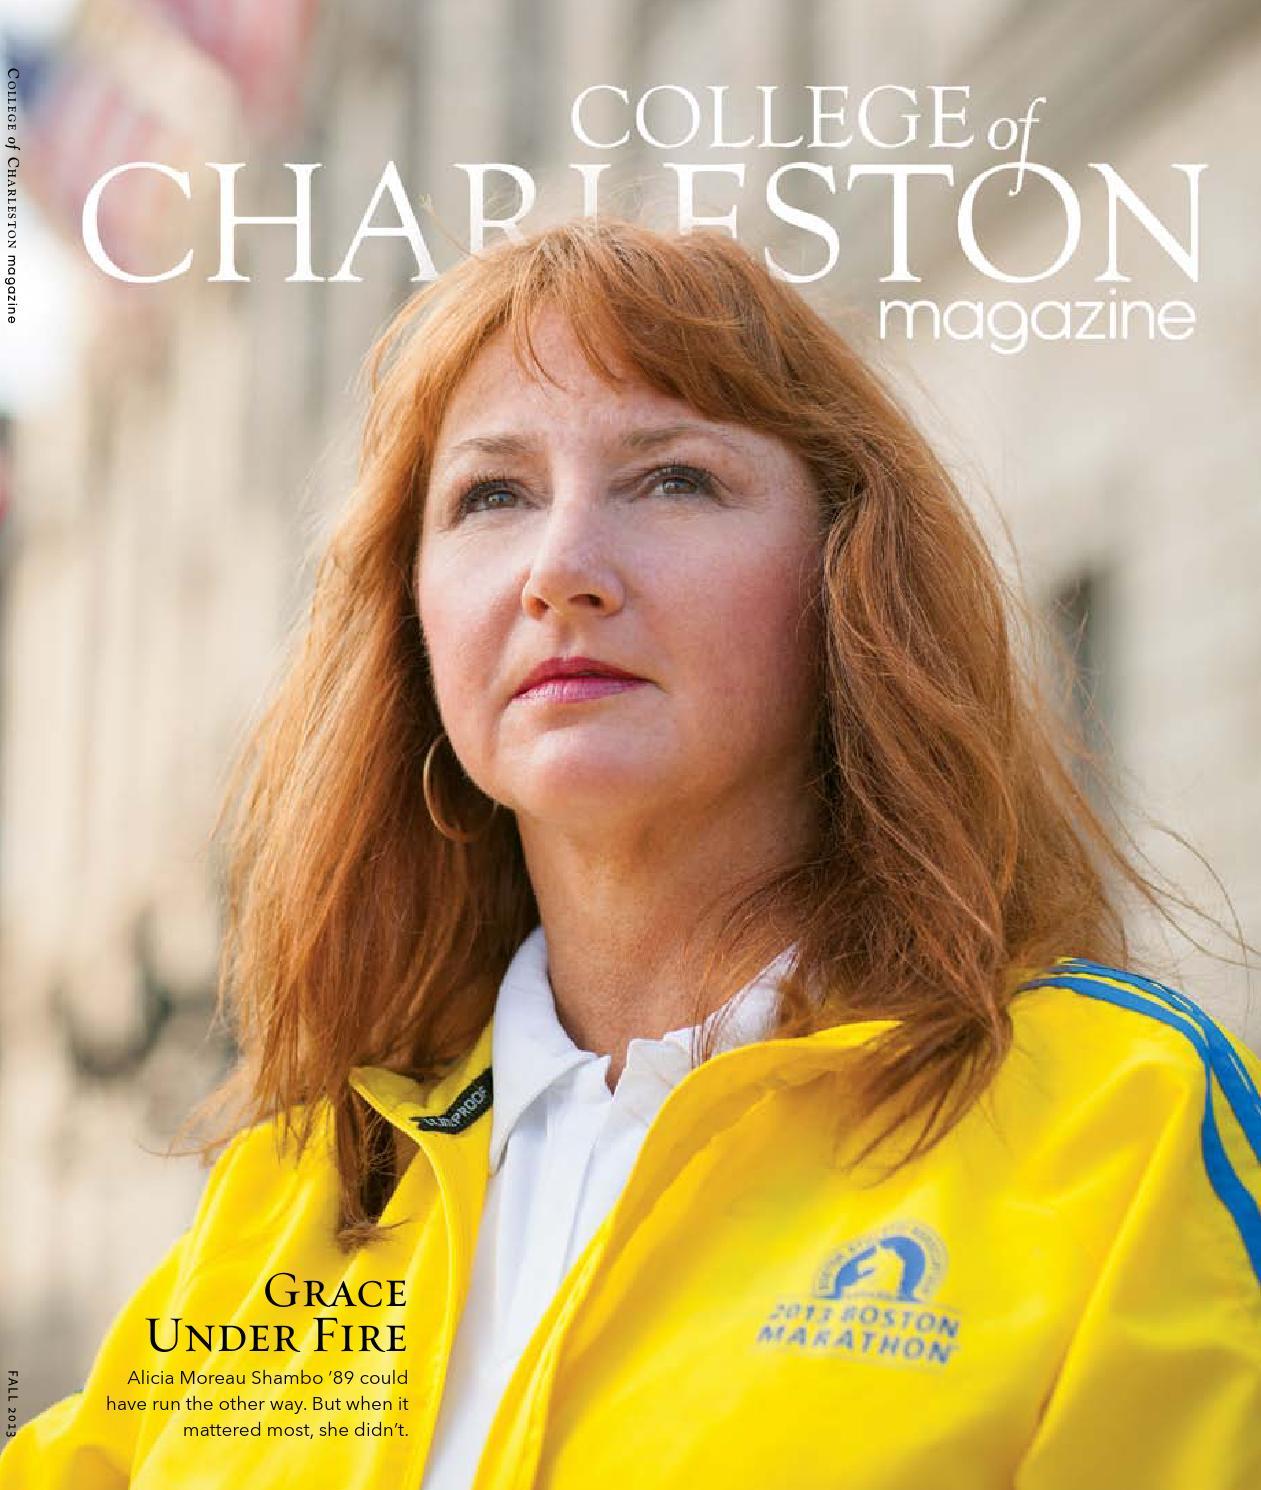 College of Charleston Magazine Fall 2013 by College of Charleston - issuu